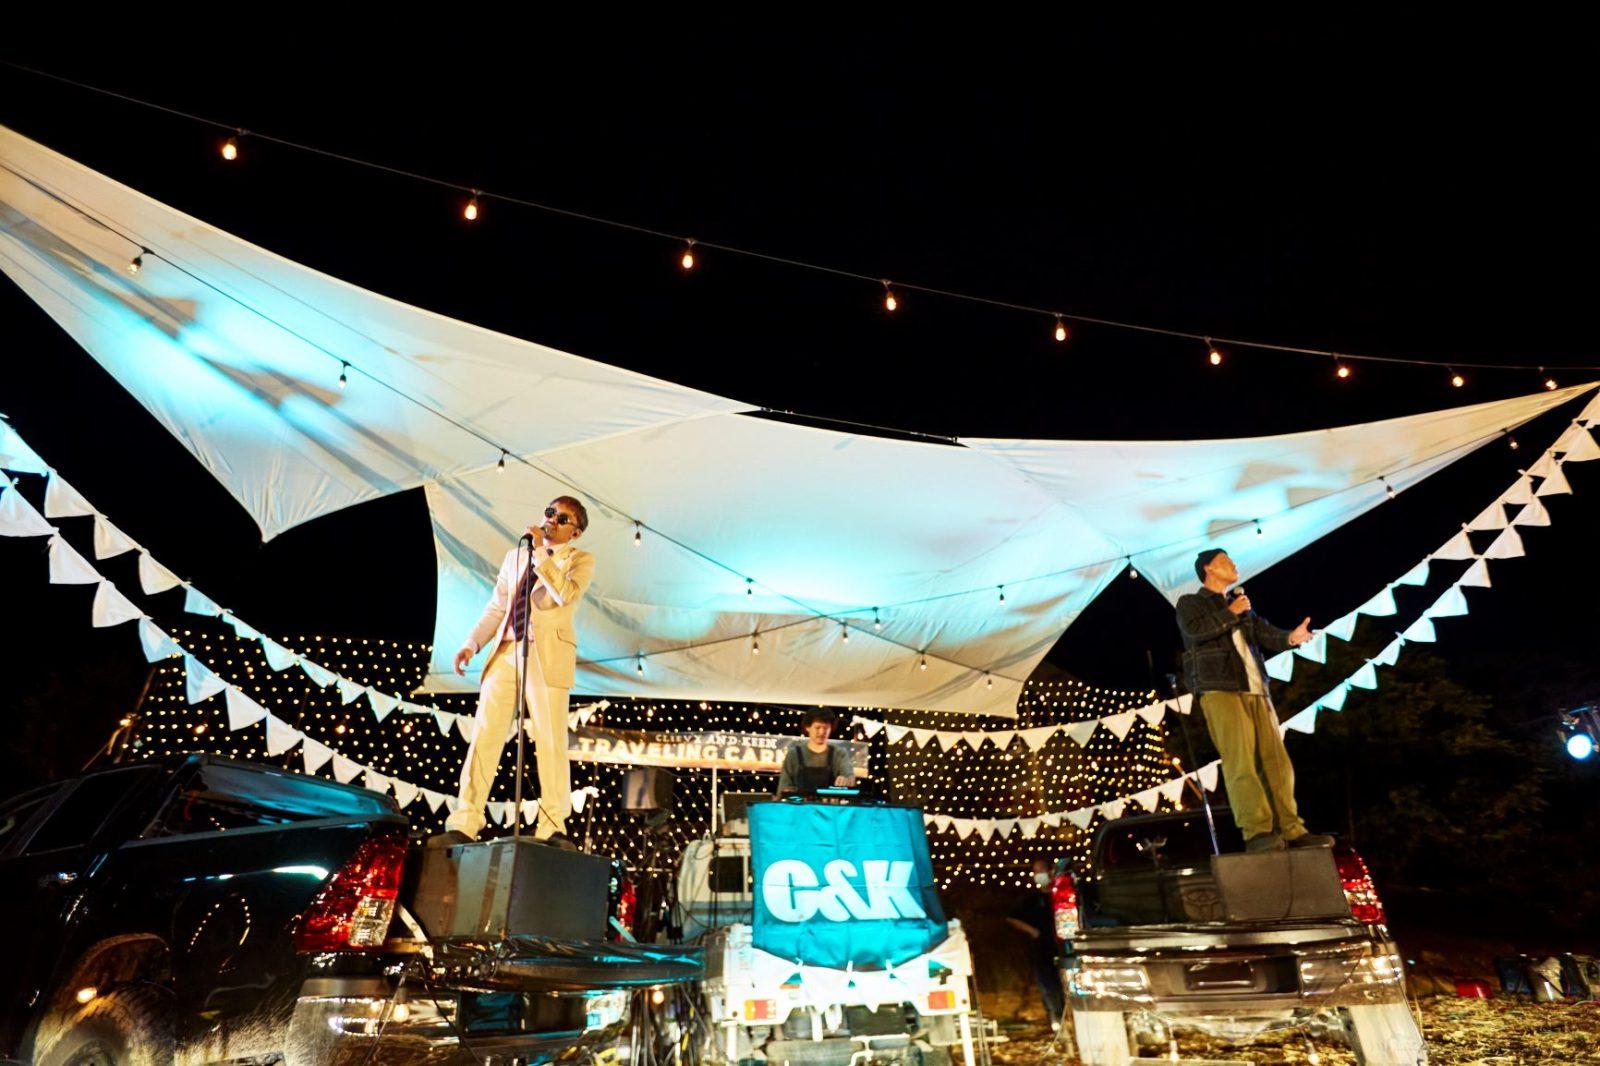 "C&K メジャーアーティスト初の試み、約4か月振りとなる生ライブ実現! ""ドライブインライブ""大盛況のうち終了サムネイル画像"